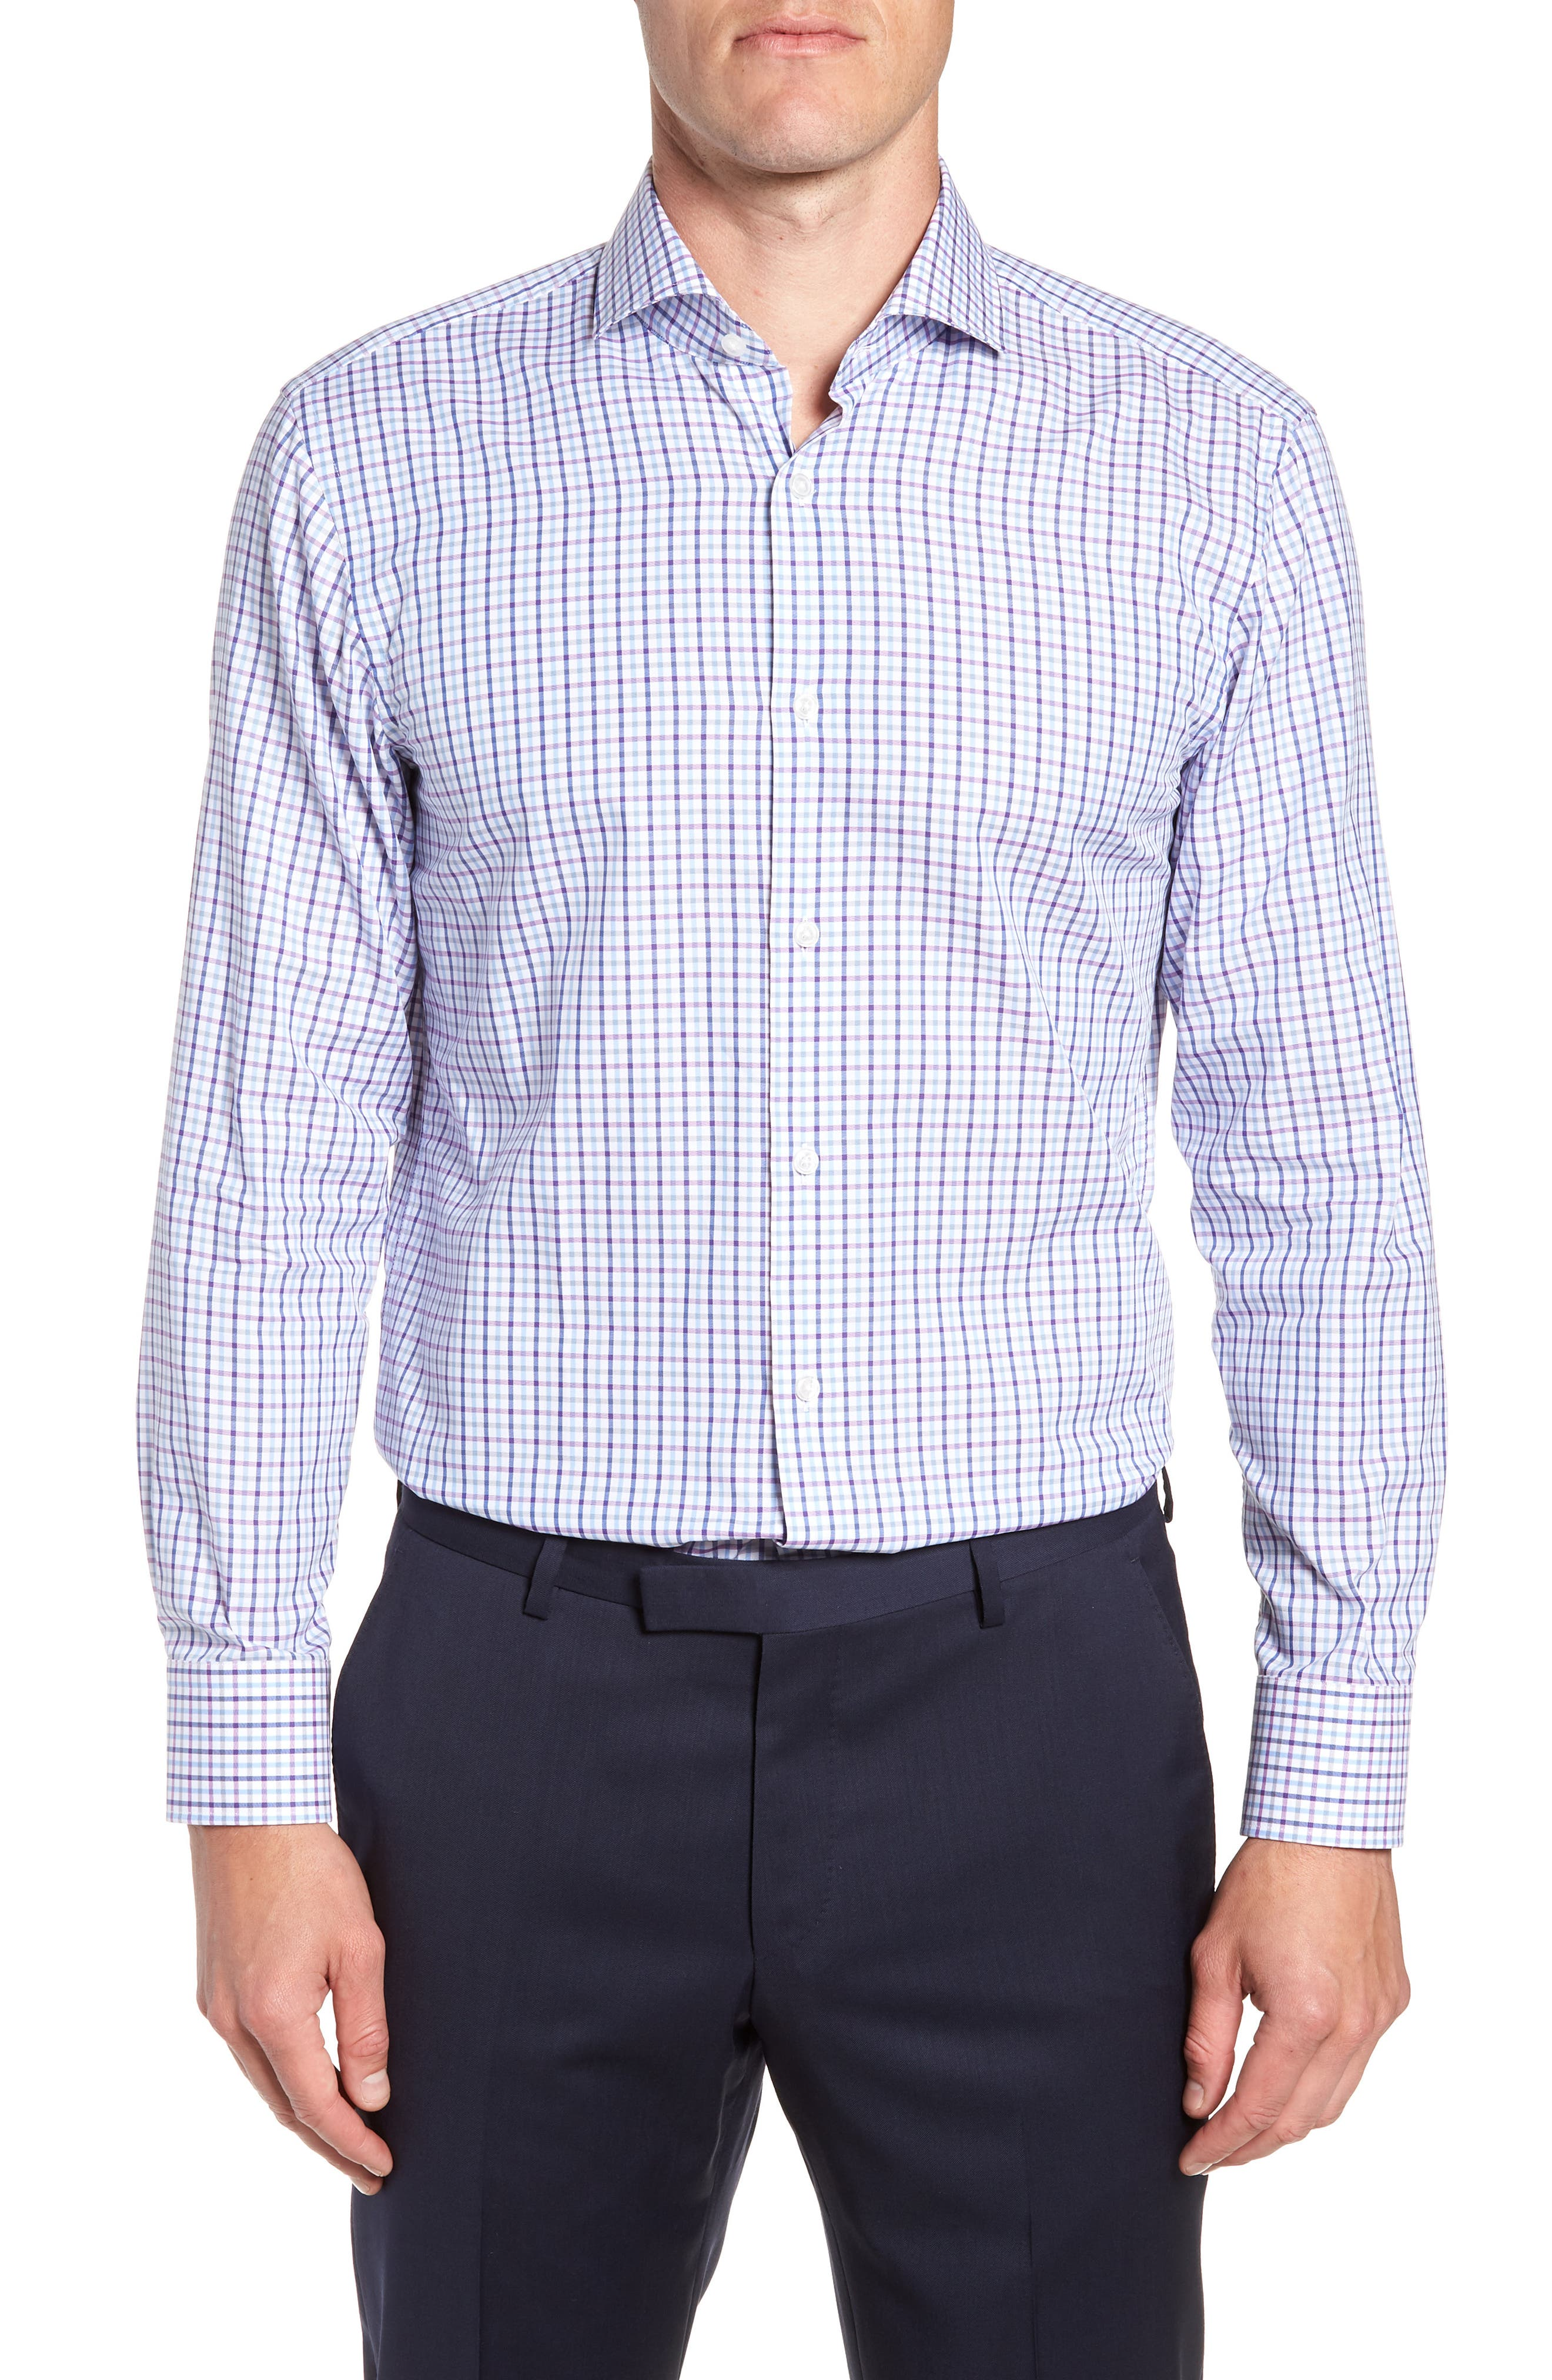 Sharp Fit Mark Check Dress Shirt,                             Main thumbnail 1, color,                             PURPLE